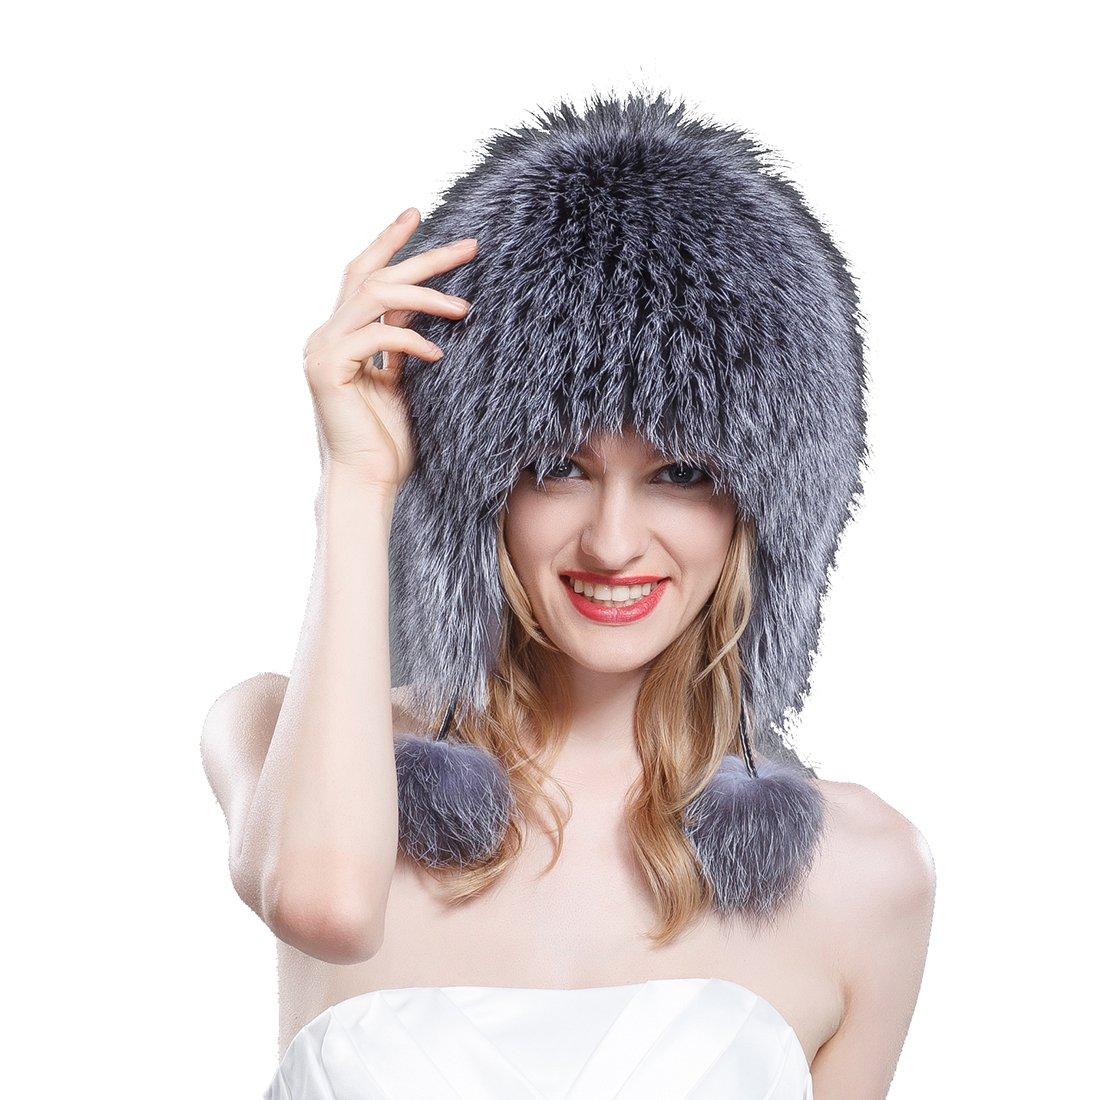 URSFUR Fox Fur Bonnet Hat with Pom Poms